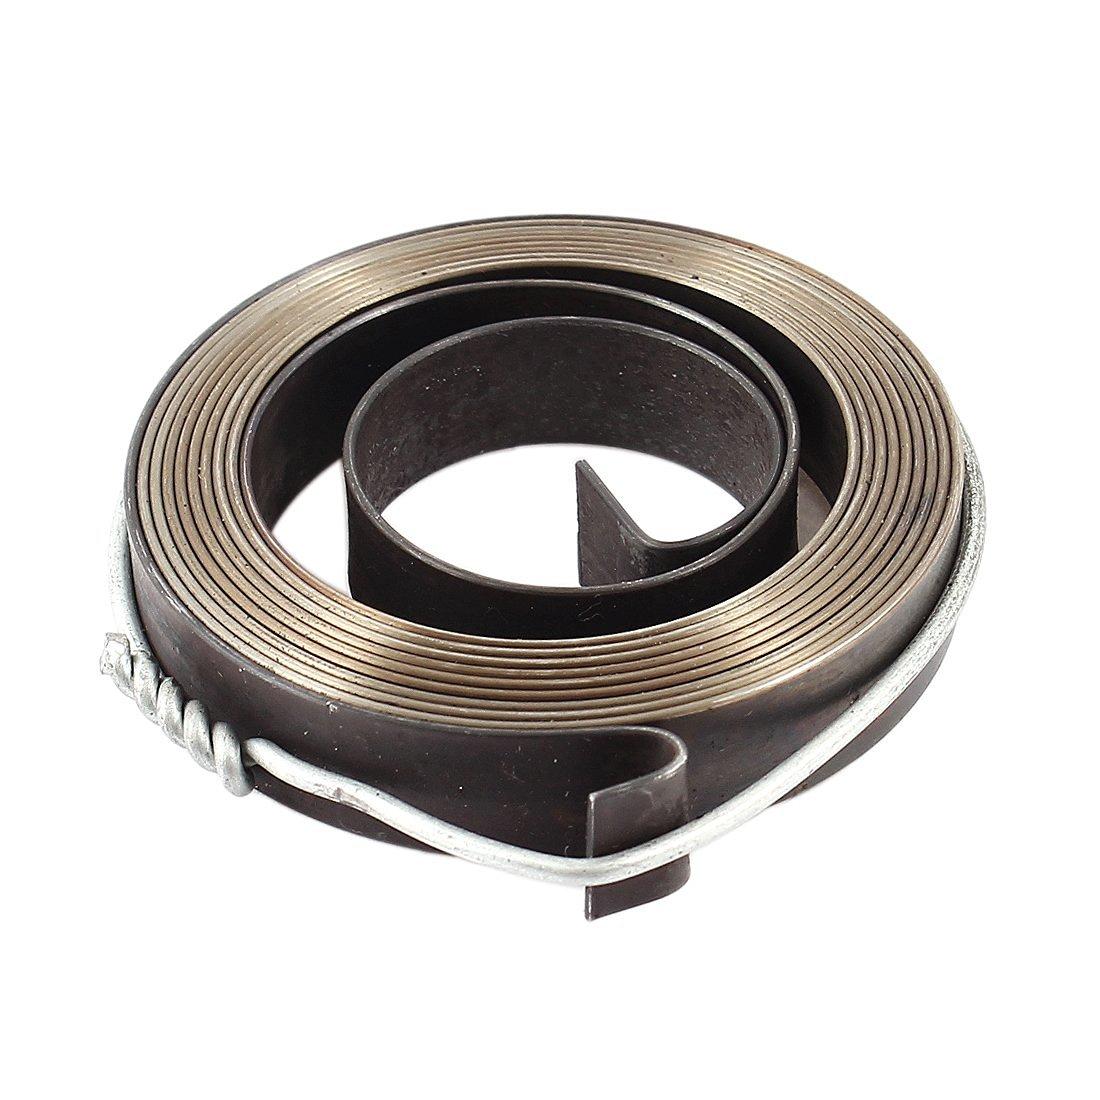 uxcell Steel Recoil Starter Spring for Bench Drill Z512-2 Z516 Z512B 10mm Width Gray